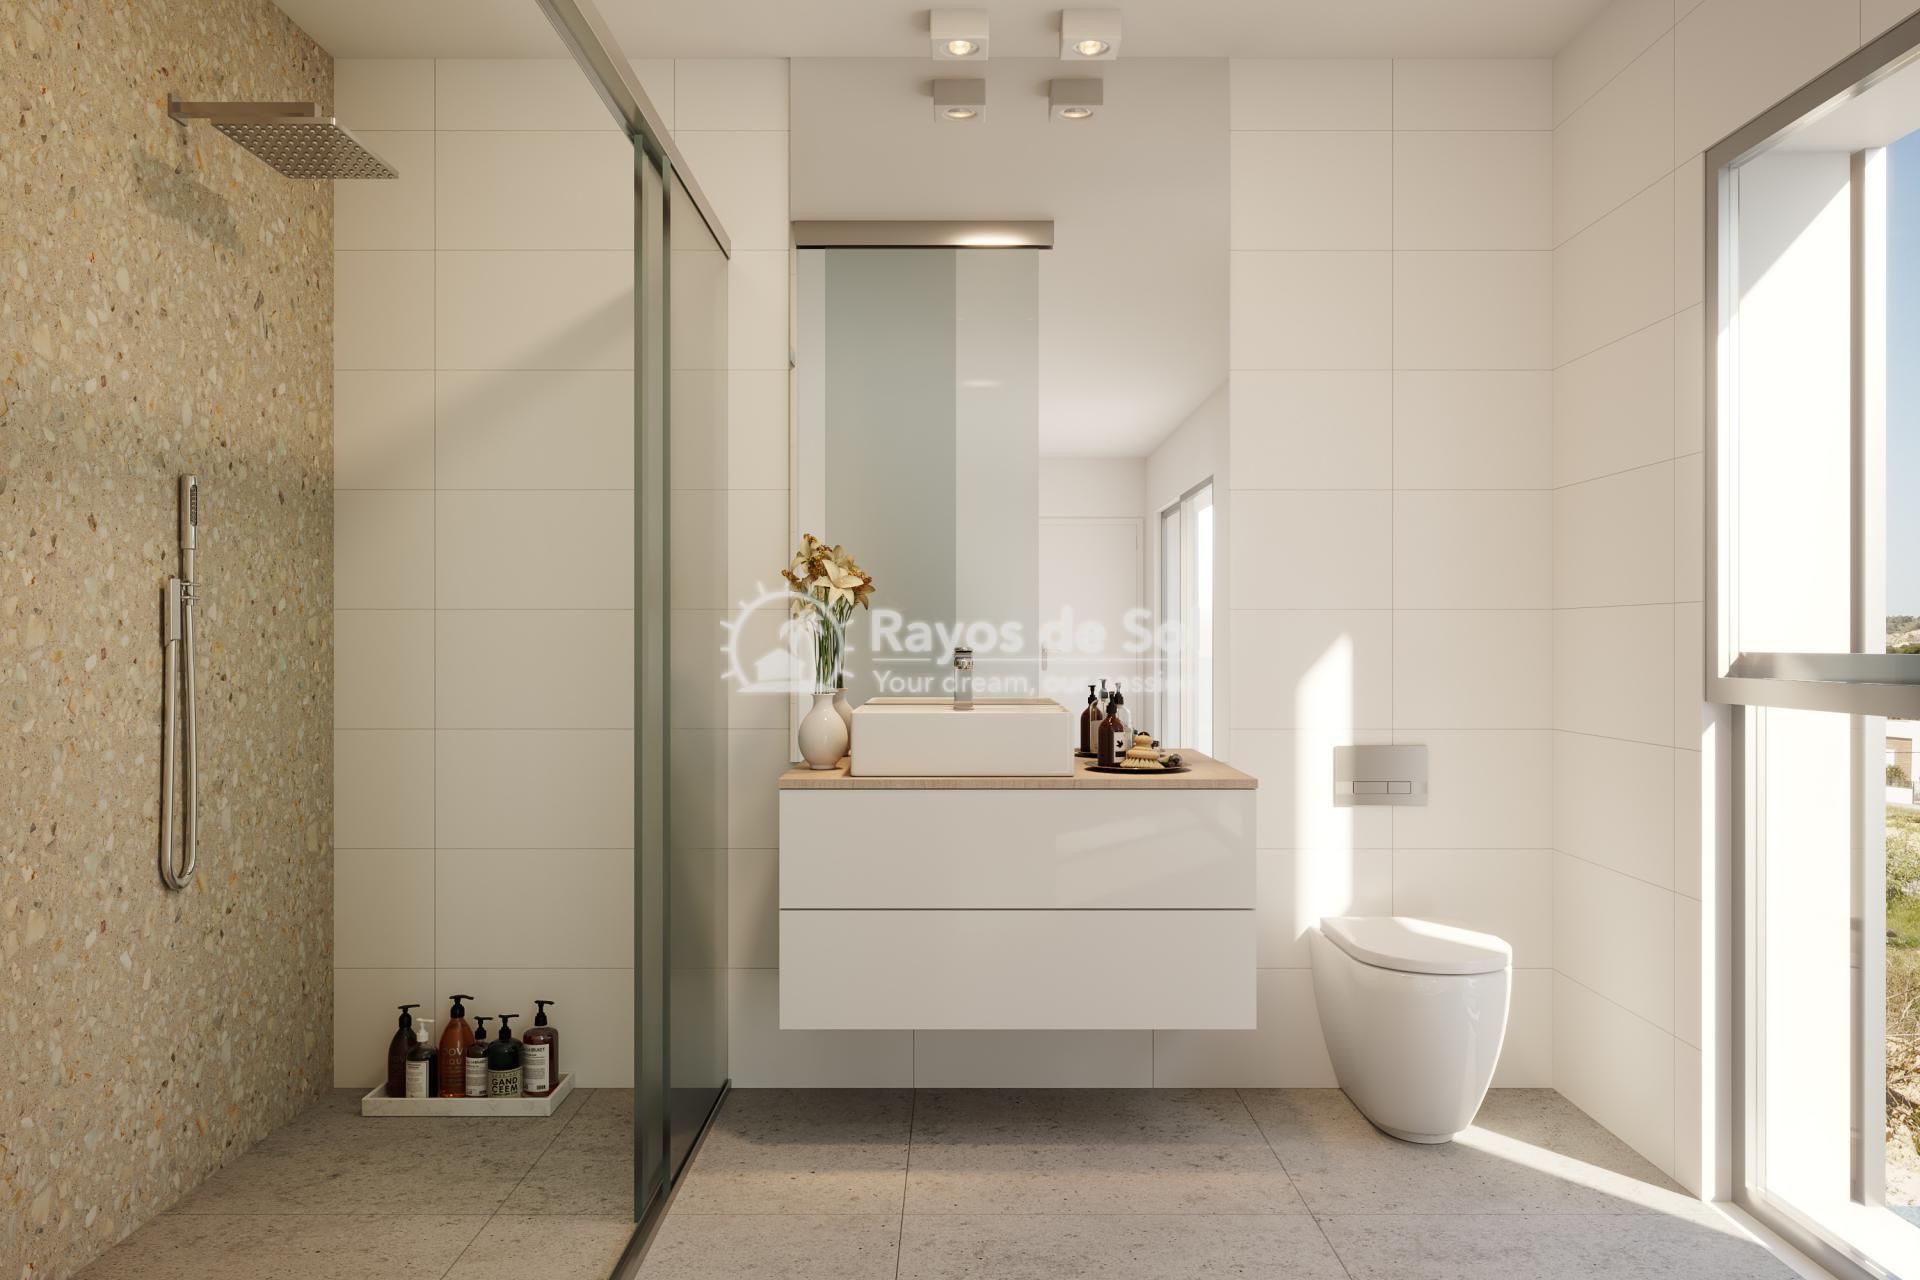 Luxury newbuild villa in La Finca Golf, Algorfa, Costa Blanca (LFPADI) - 17